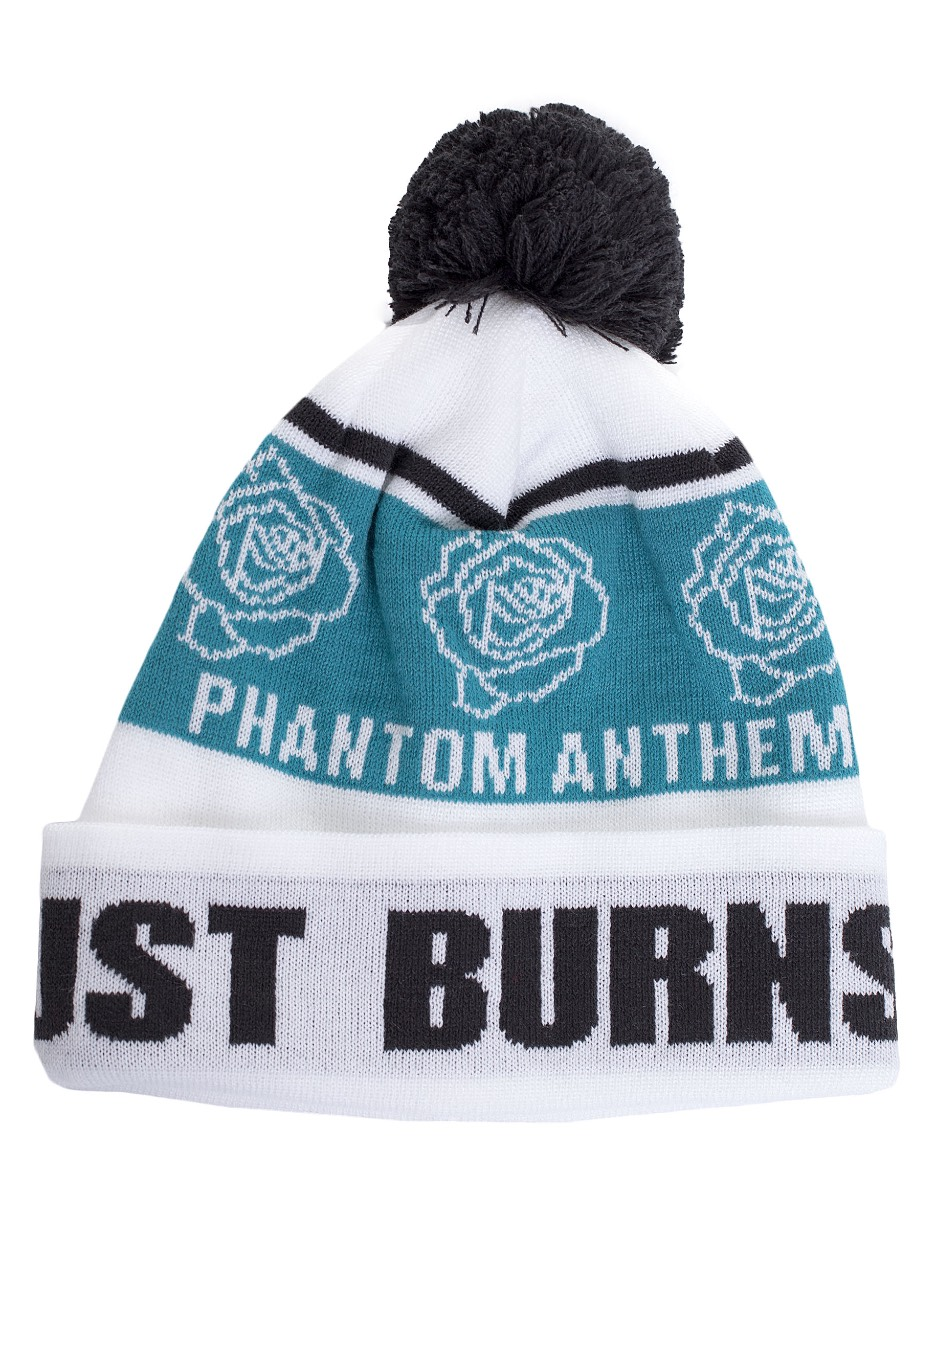 700865102a2 ... August Burns Red - Phantom Anthem Light Green Pom - Beanie ...